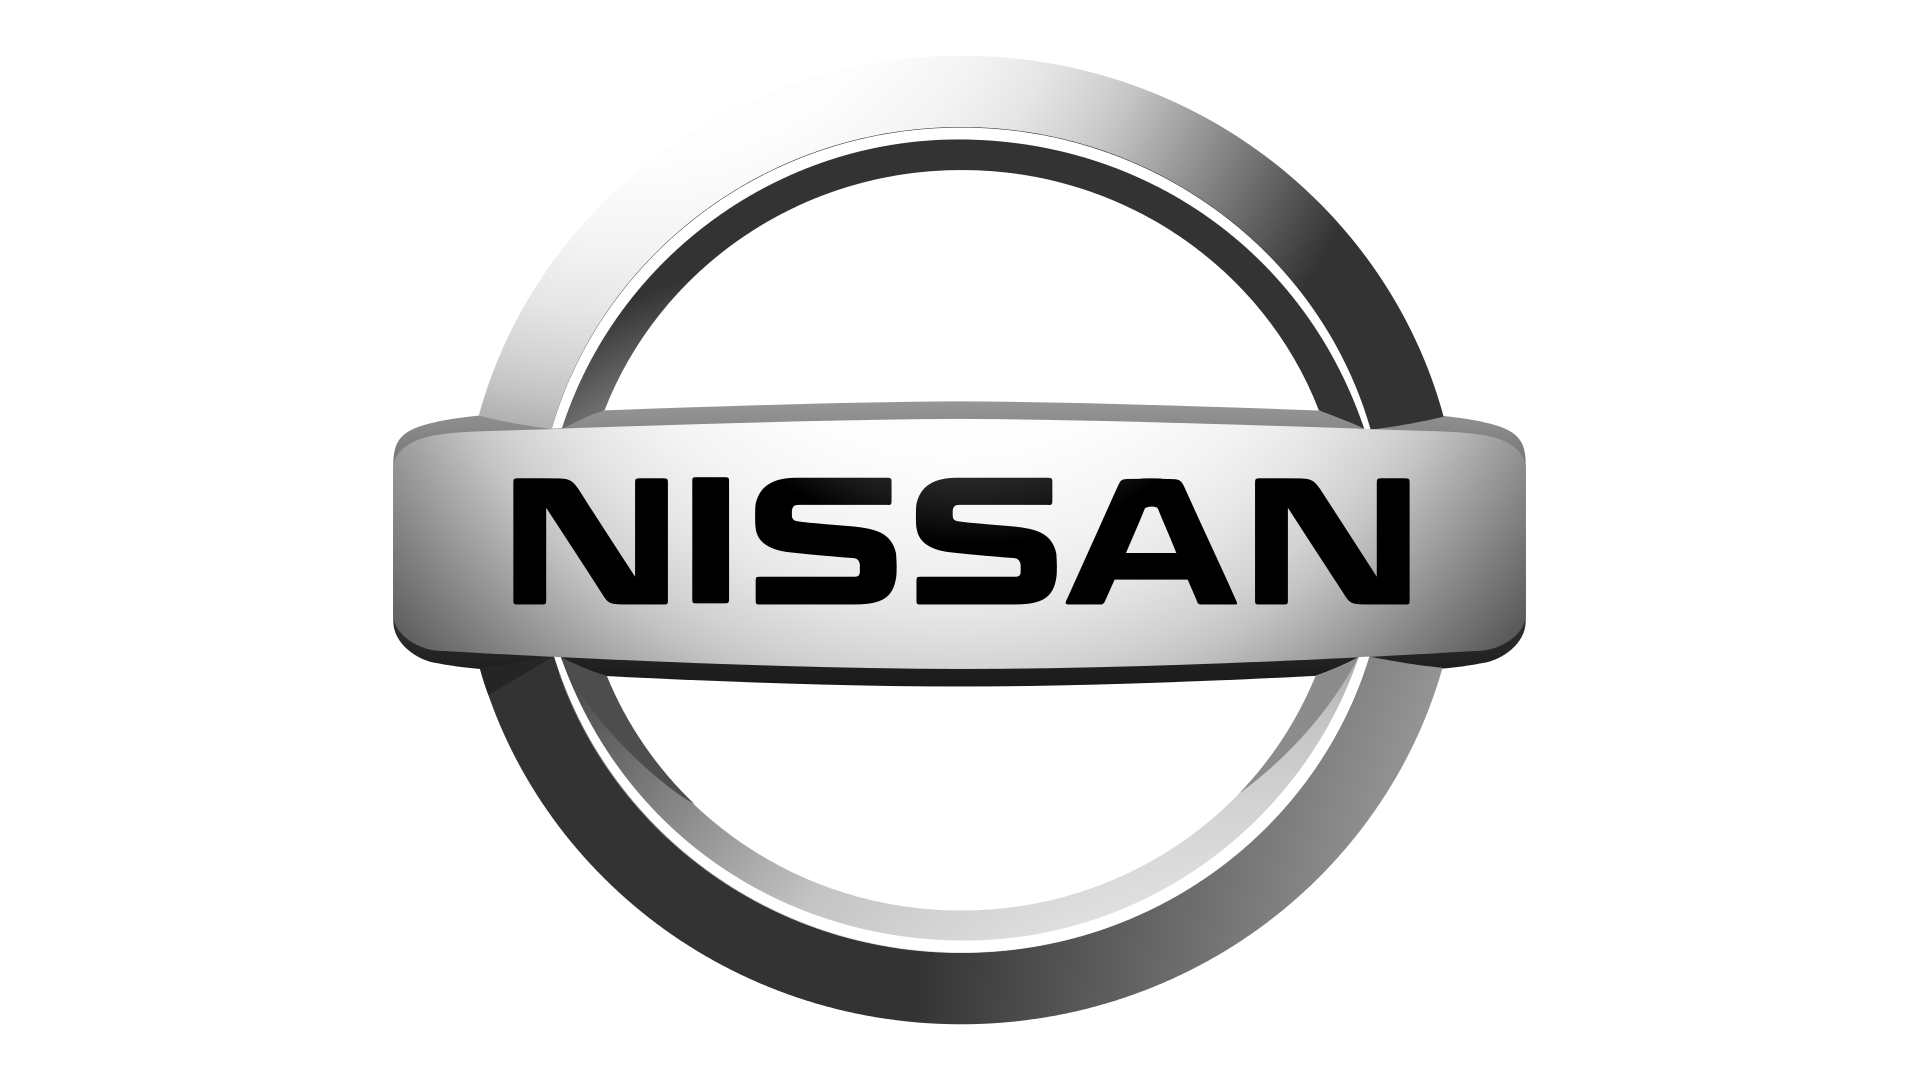 Nissan Symbol 1920X1080 (Hd 1080P) - Nissan, Transparent background PNG HD thumbnail